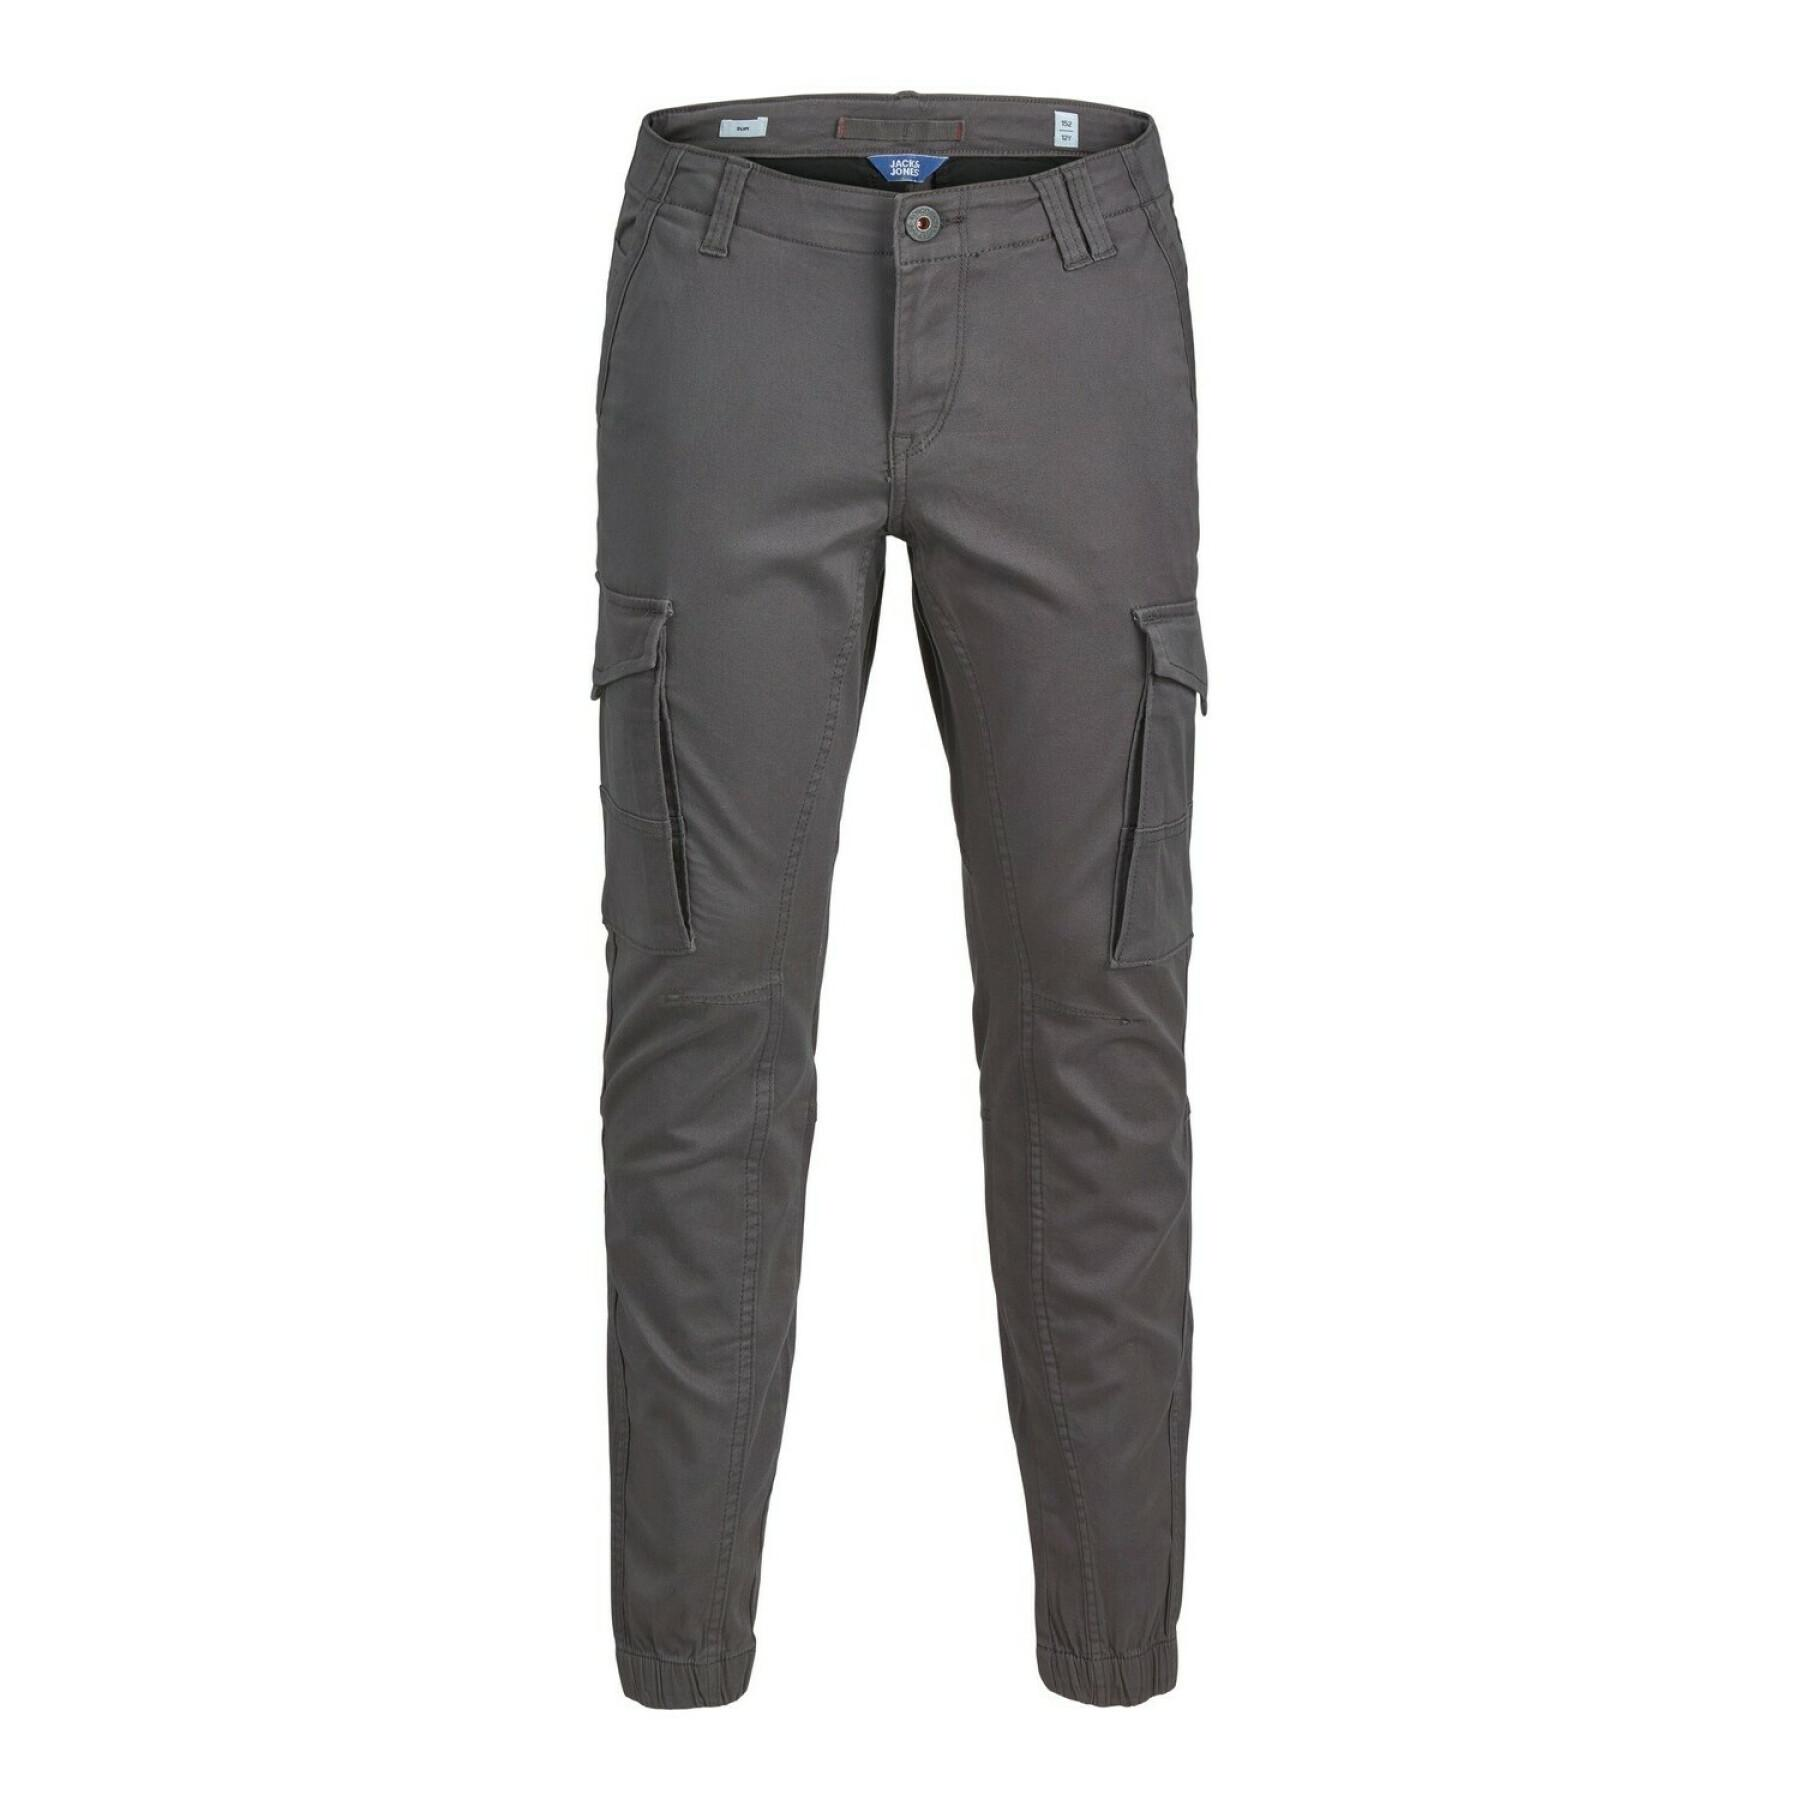 Pantalones para niños Jack & Jones Paul